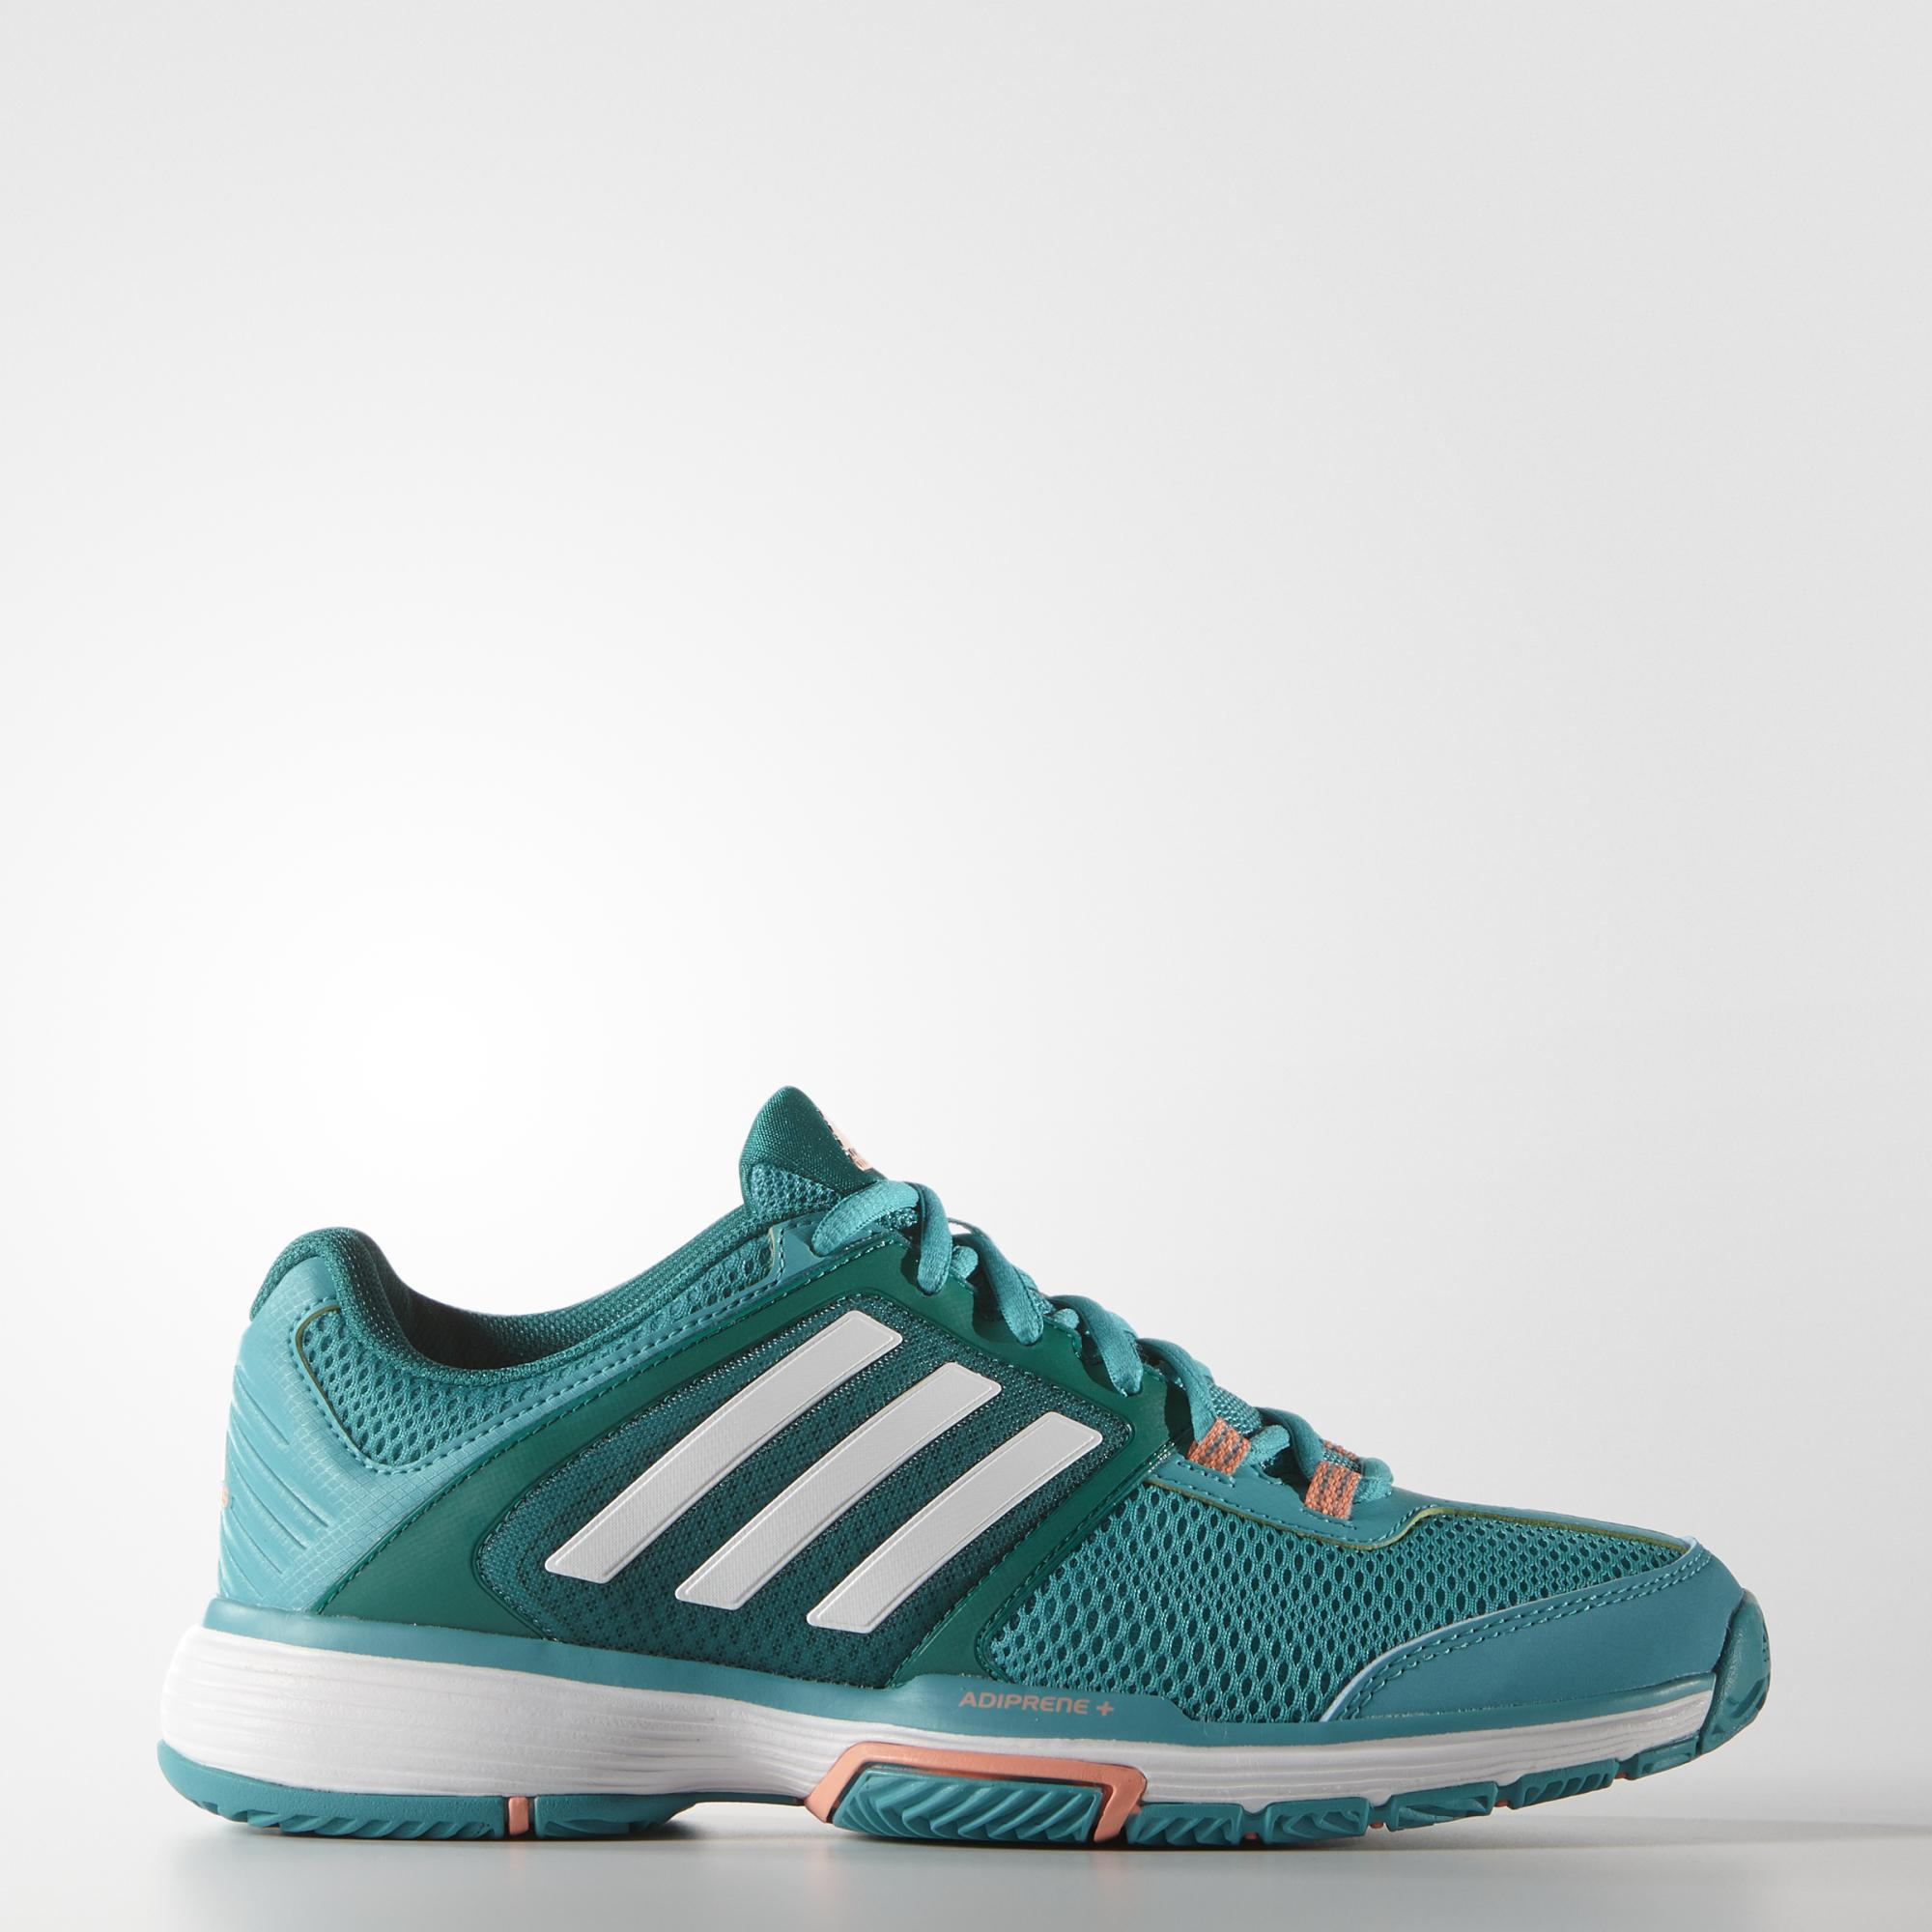 new style 81563 36260 Adidas Womens Barricade Club Tennis Shoes - Green